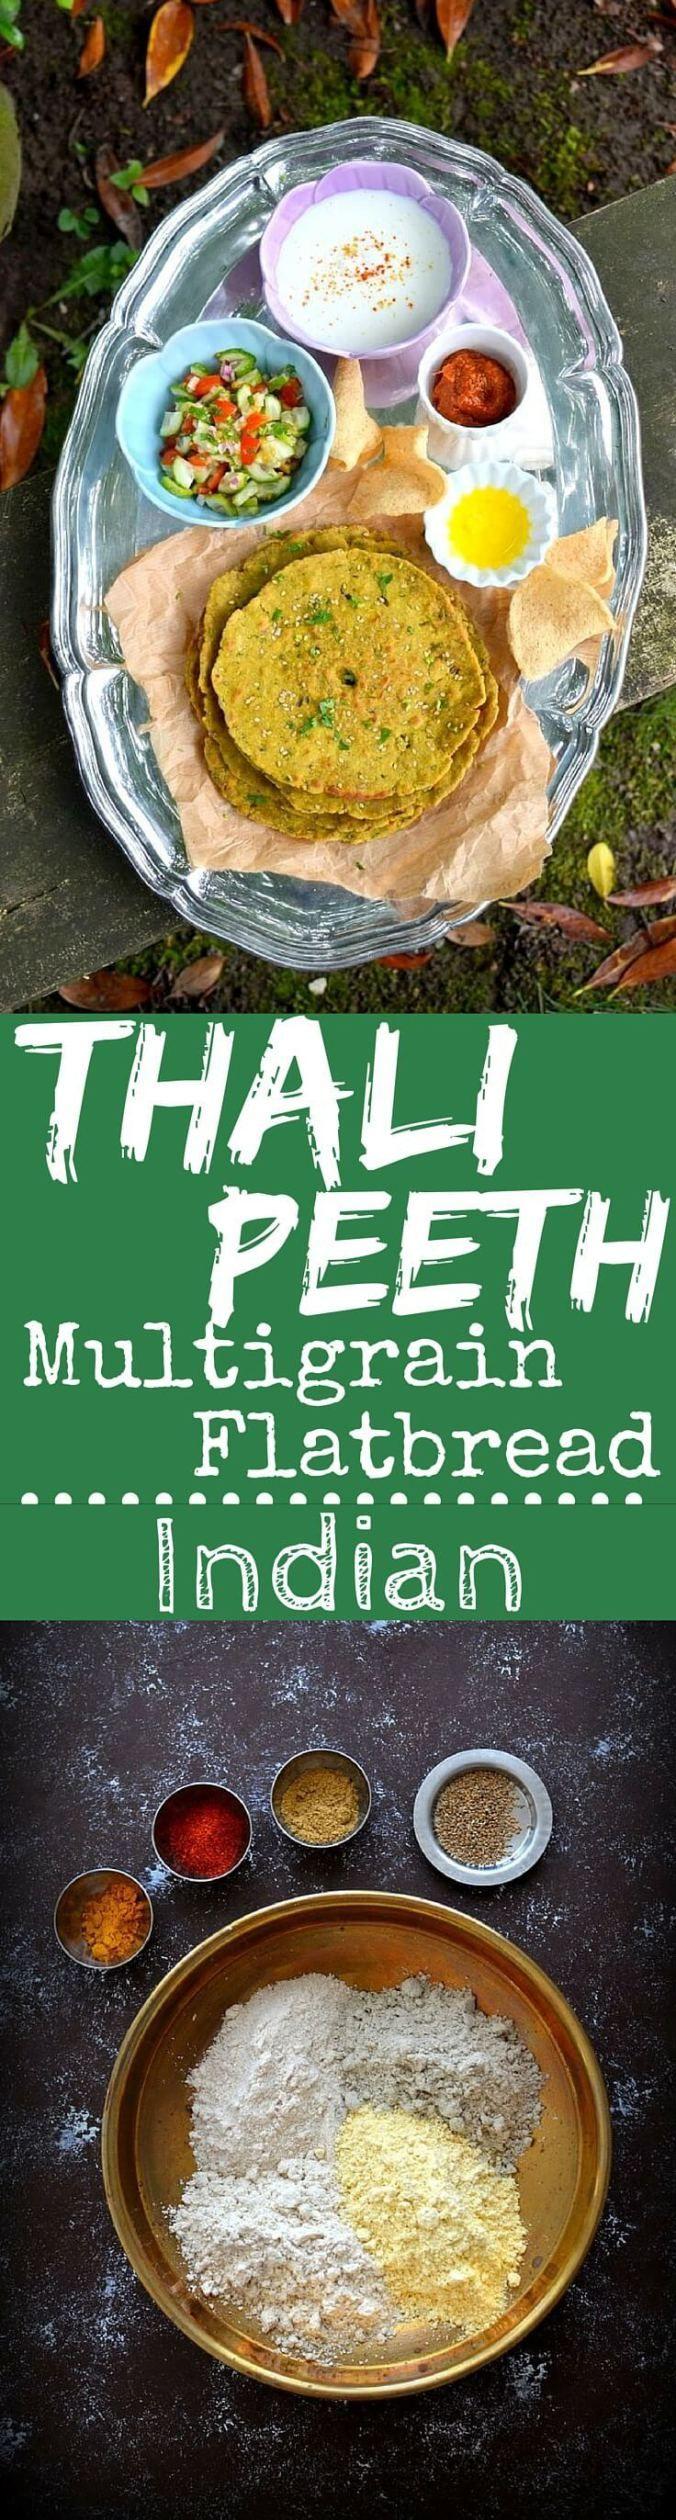 Bring Me Flours: Thalipeeth (Indian Multi-grain Flat-bread) - Spice in the City